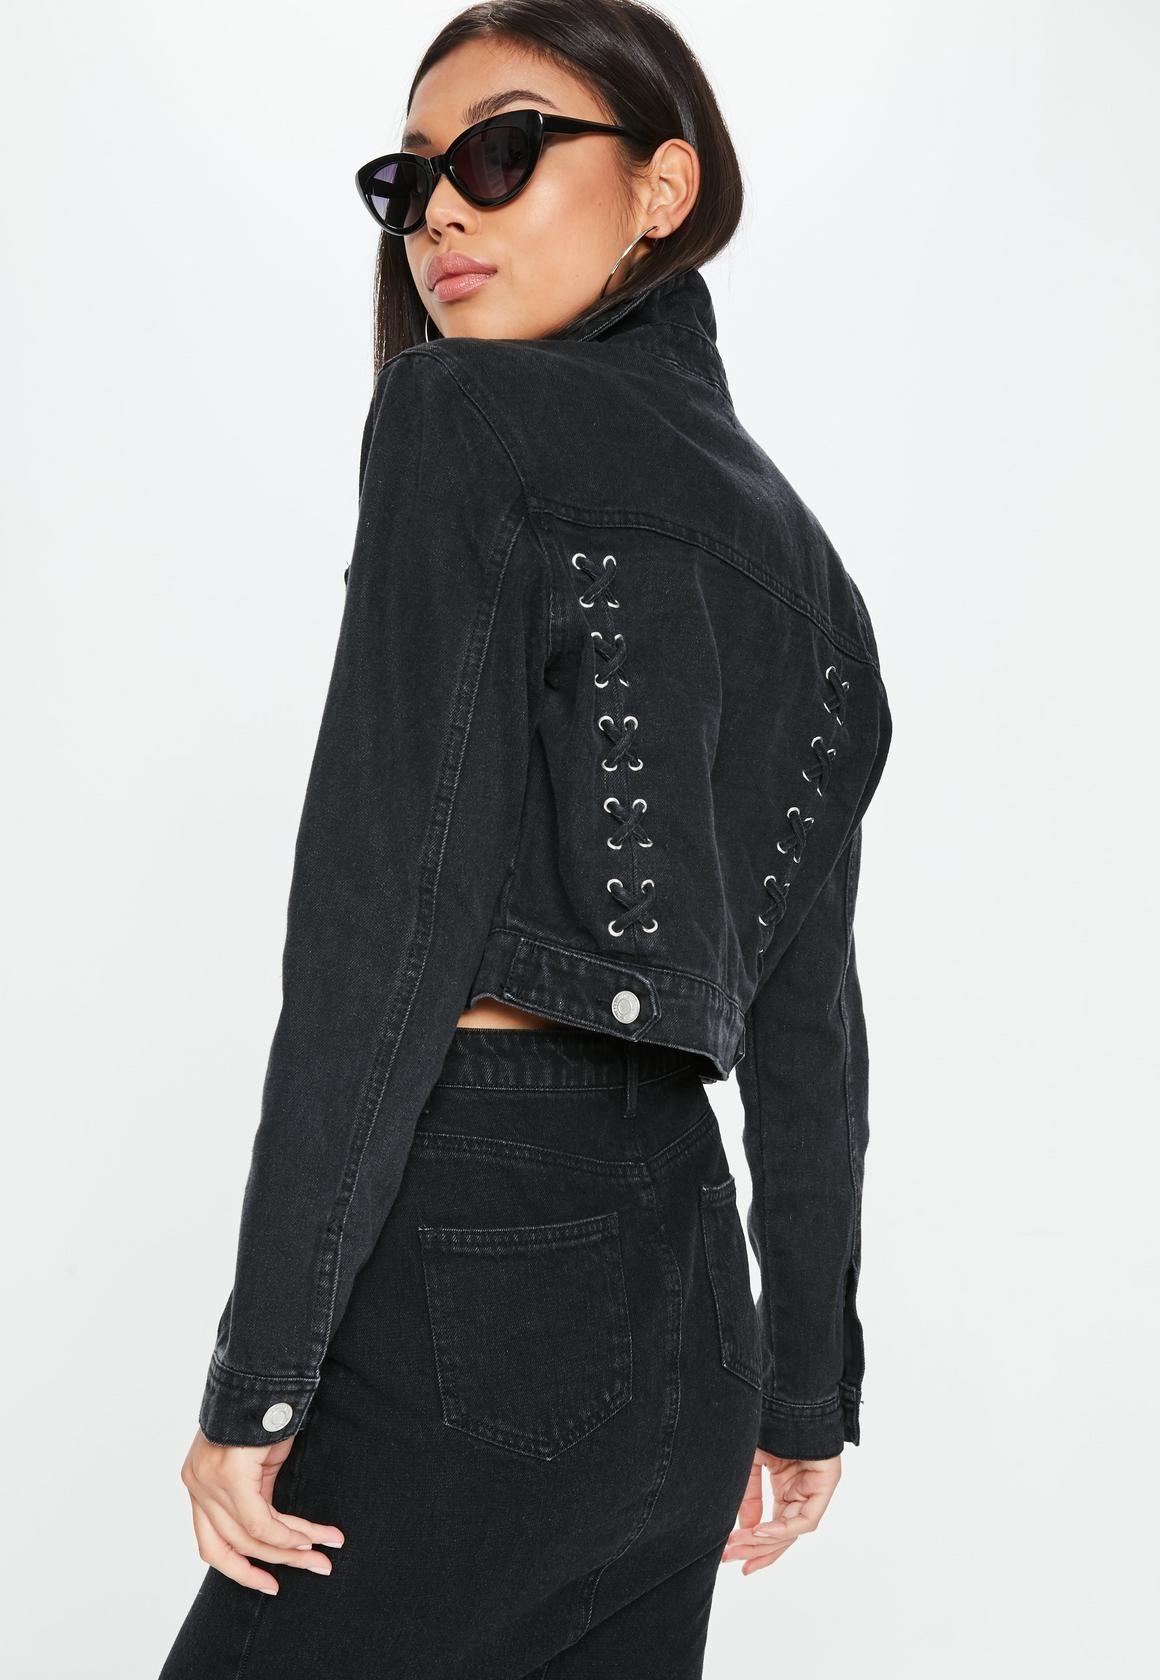 Black Denim Lace Up Back Cropped Jacket Missguided Http Spotpopfashion Com Au6m Coats Jackets Women Denim And Lace Fashion